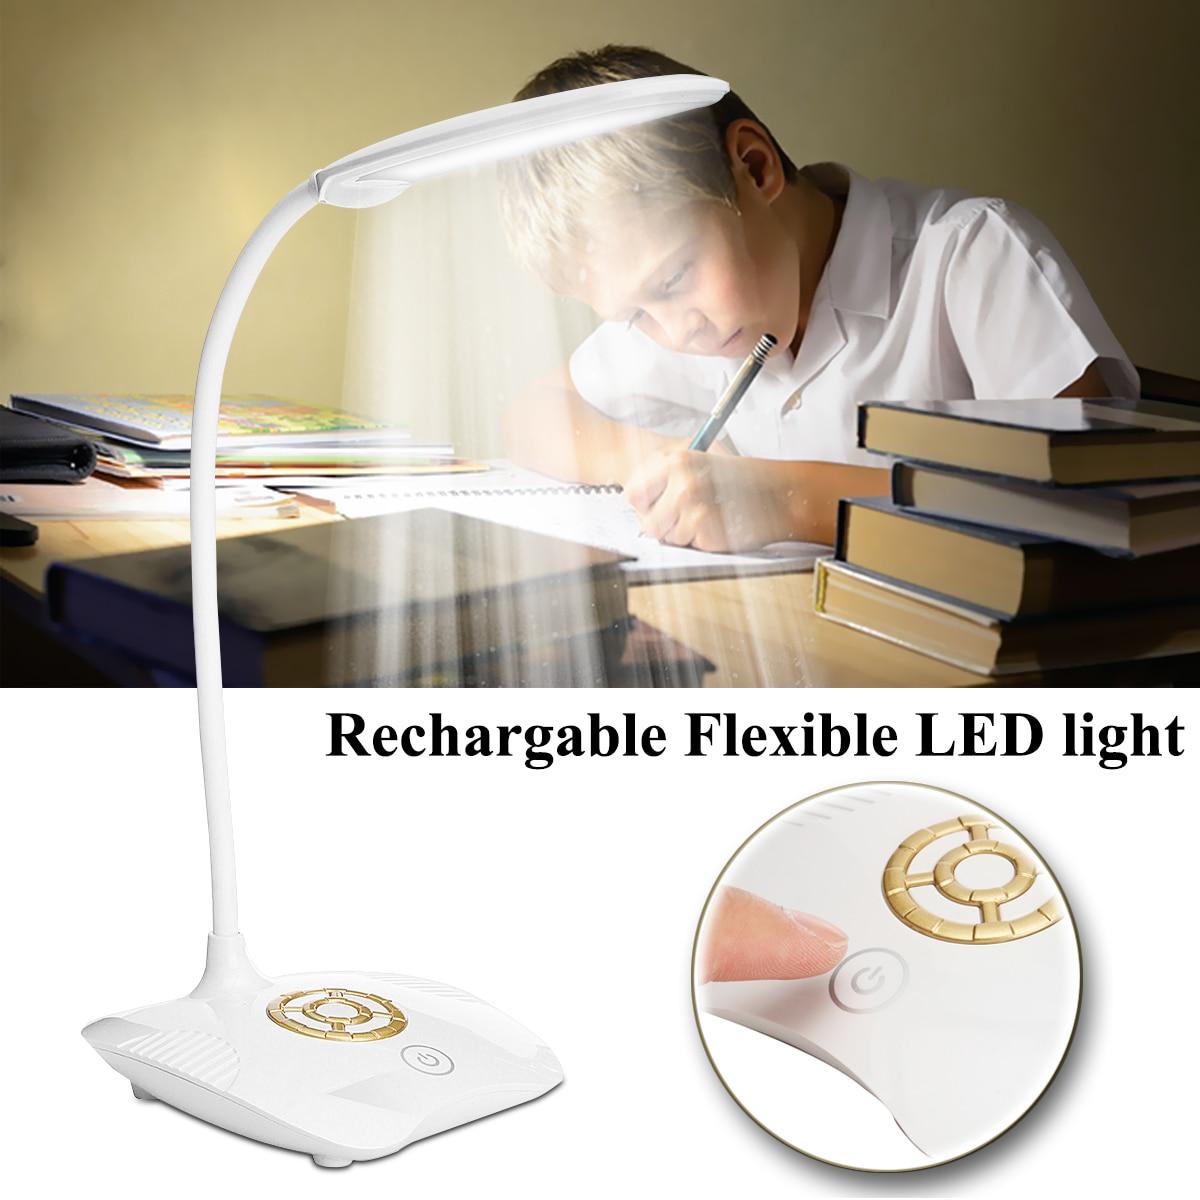 3 Brightness Flexible Rechargeable Battery Book Lamps Dimmable USB LED Night Light Bedside Desktop Reading Desk Lamp Portable